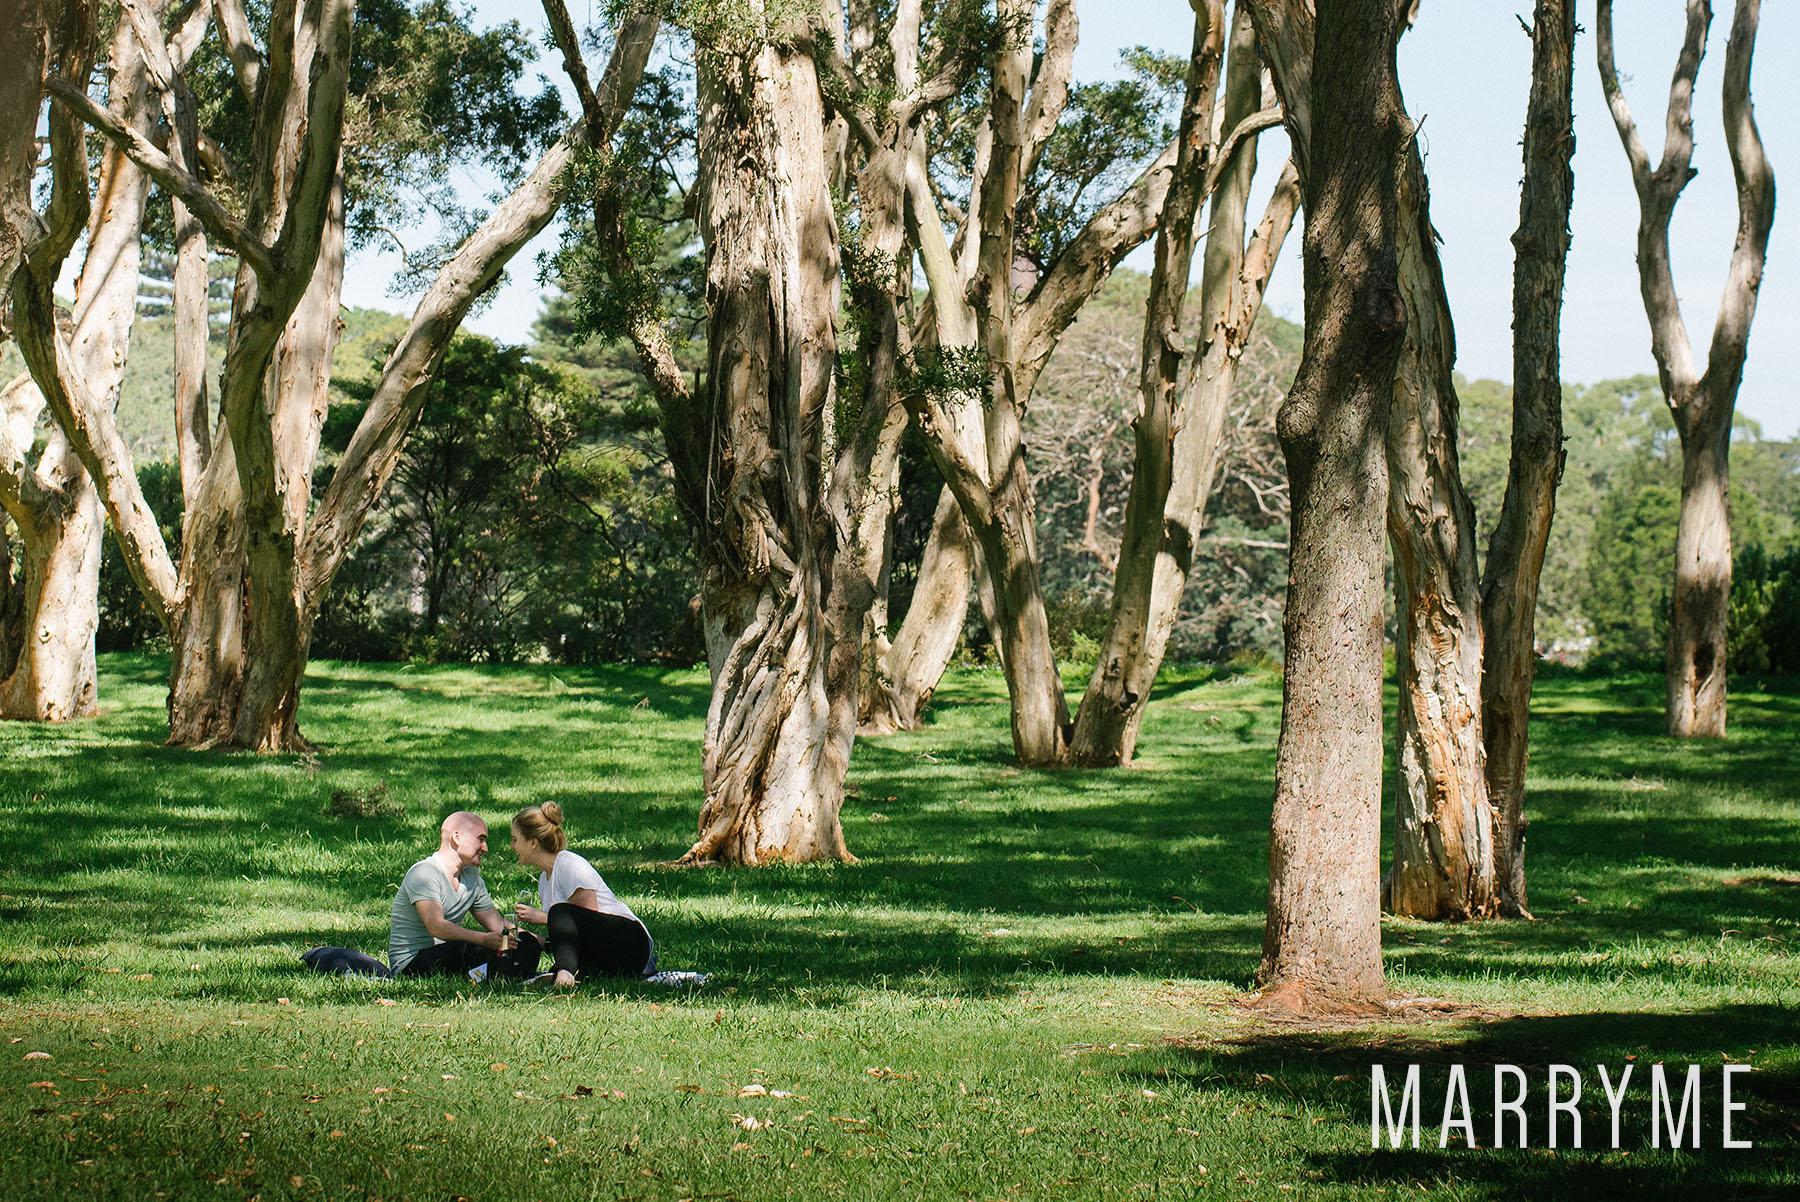 7_Centennial_Park_Parklands_marriage_proposal_sydney_marryme.jpg